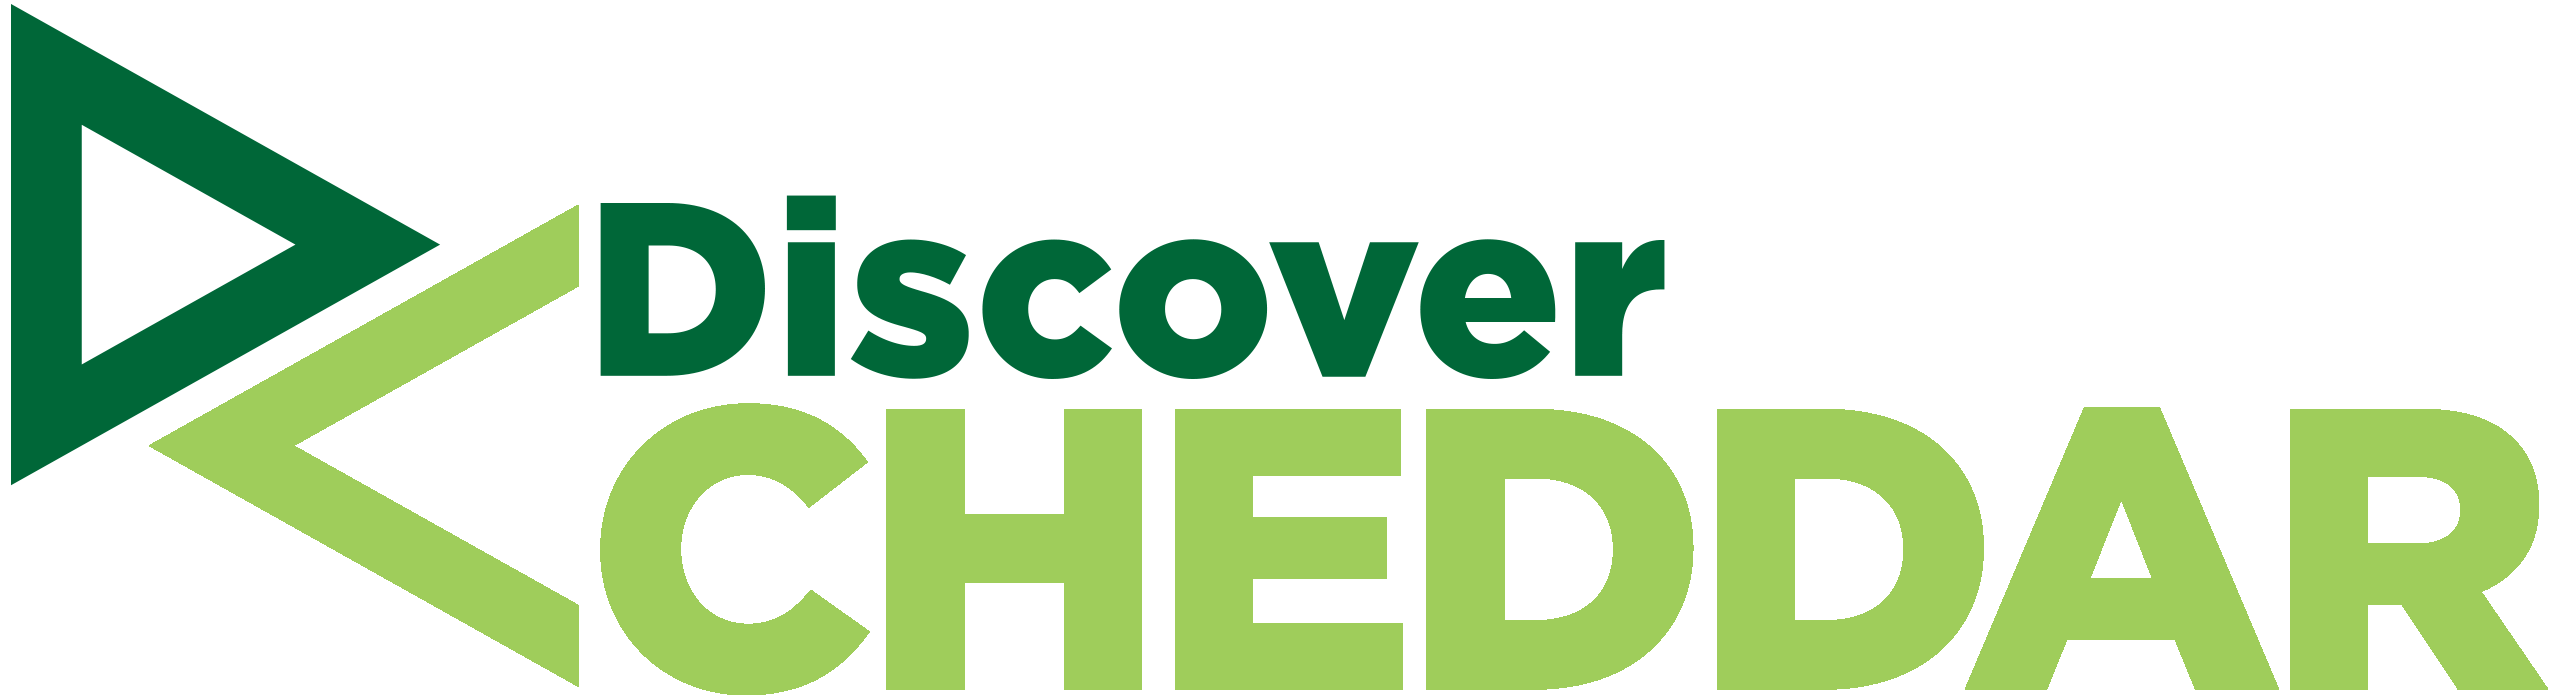 discover cheddar logo